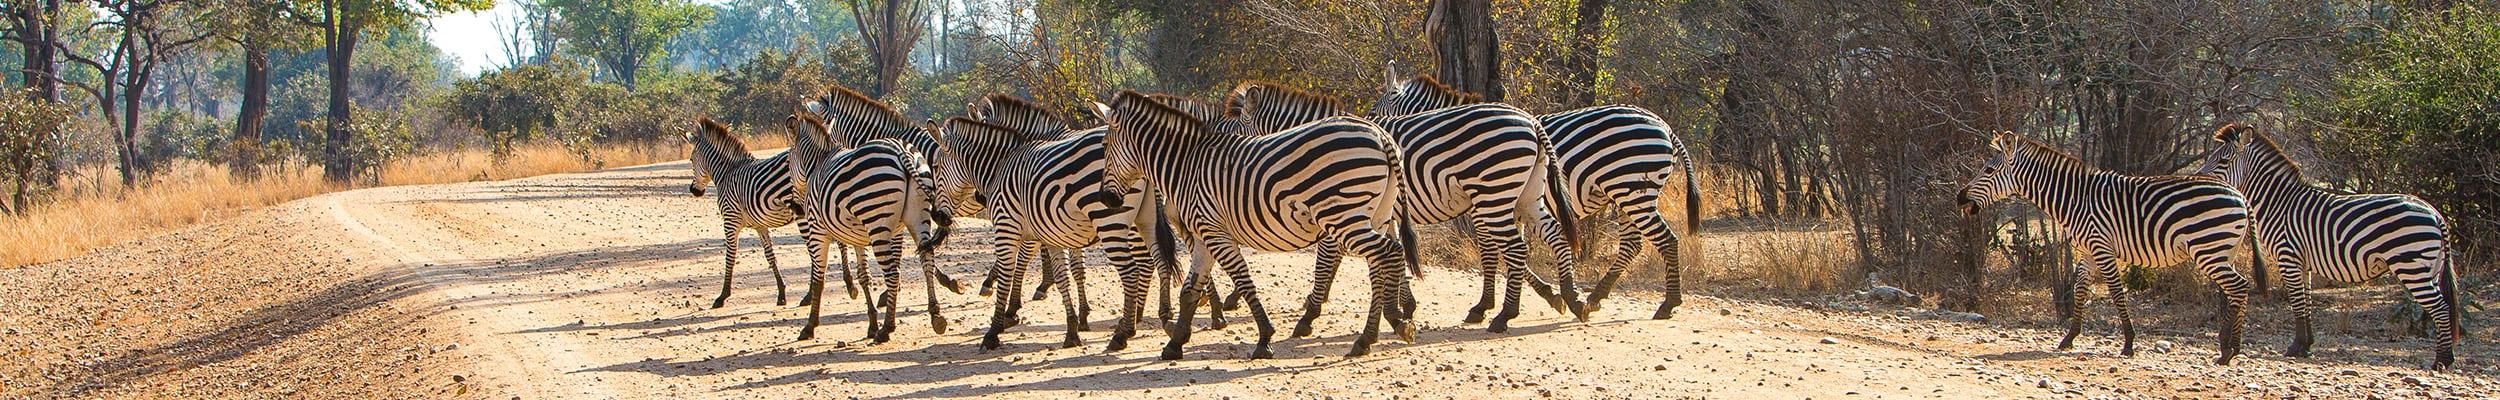 Nambiti Reserve